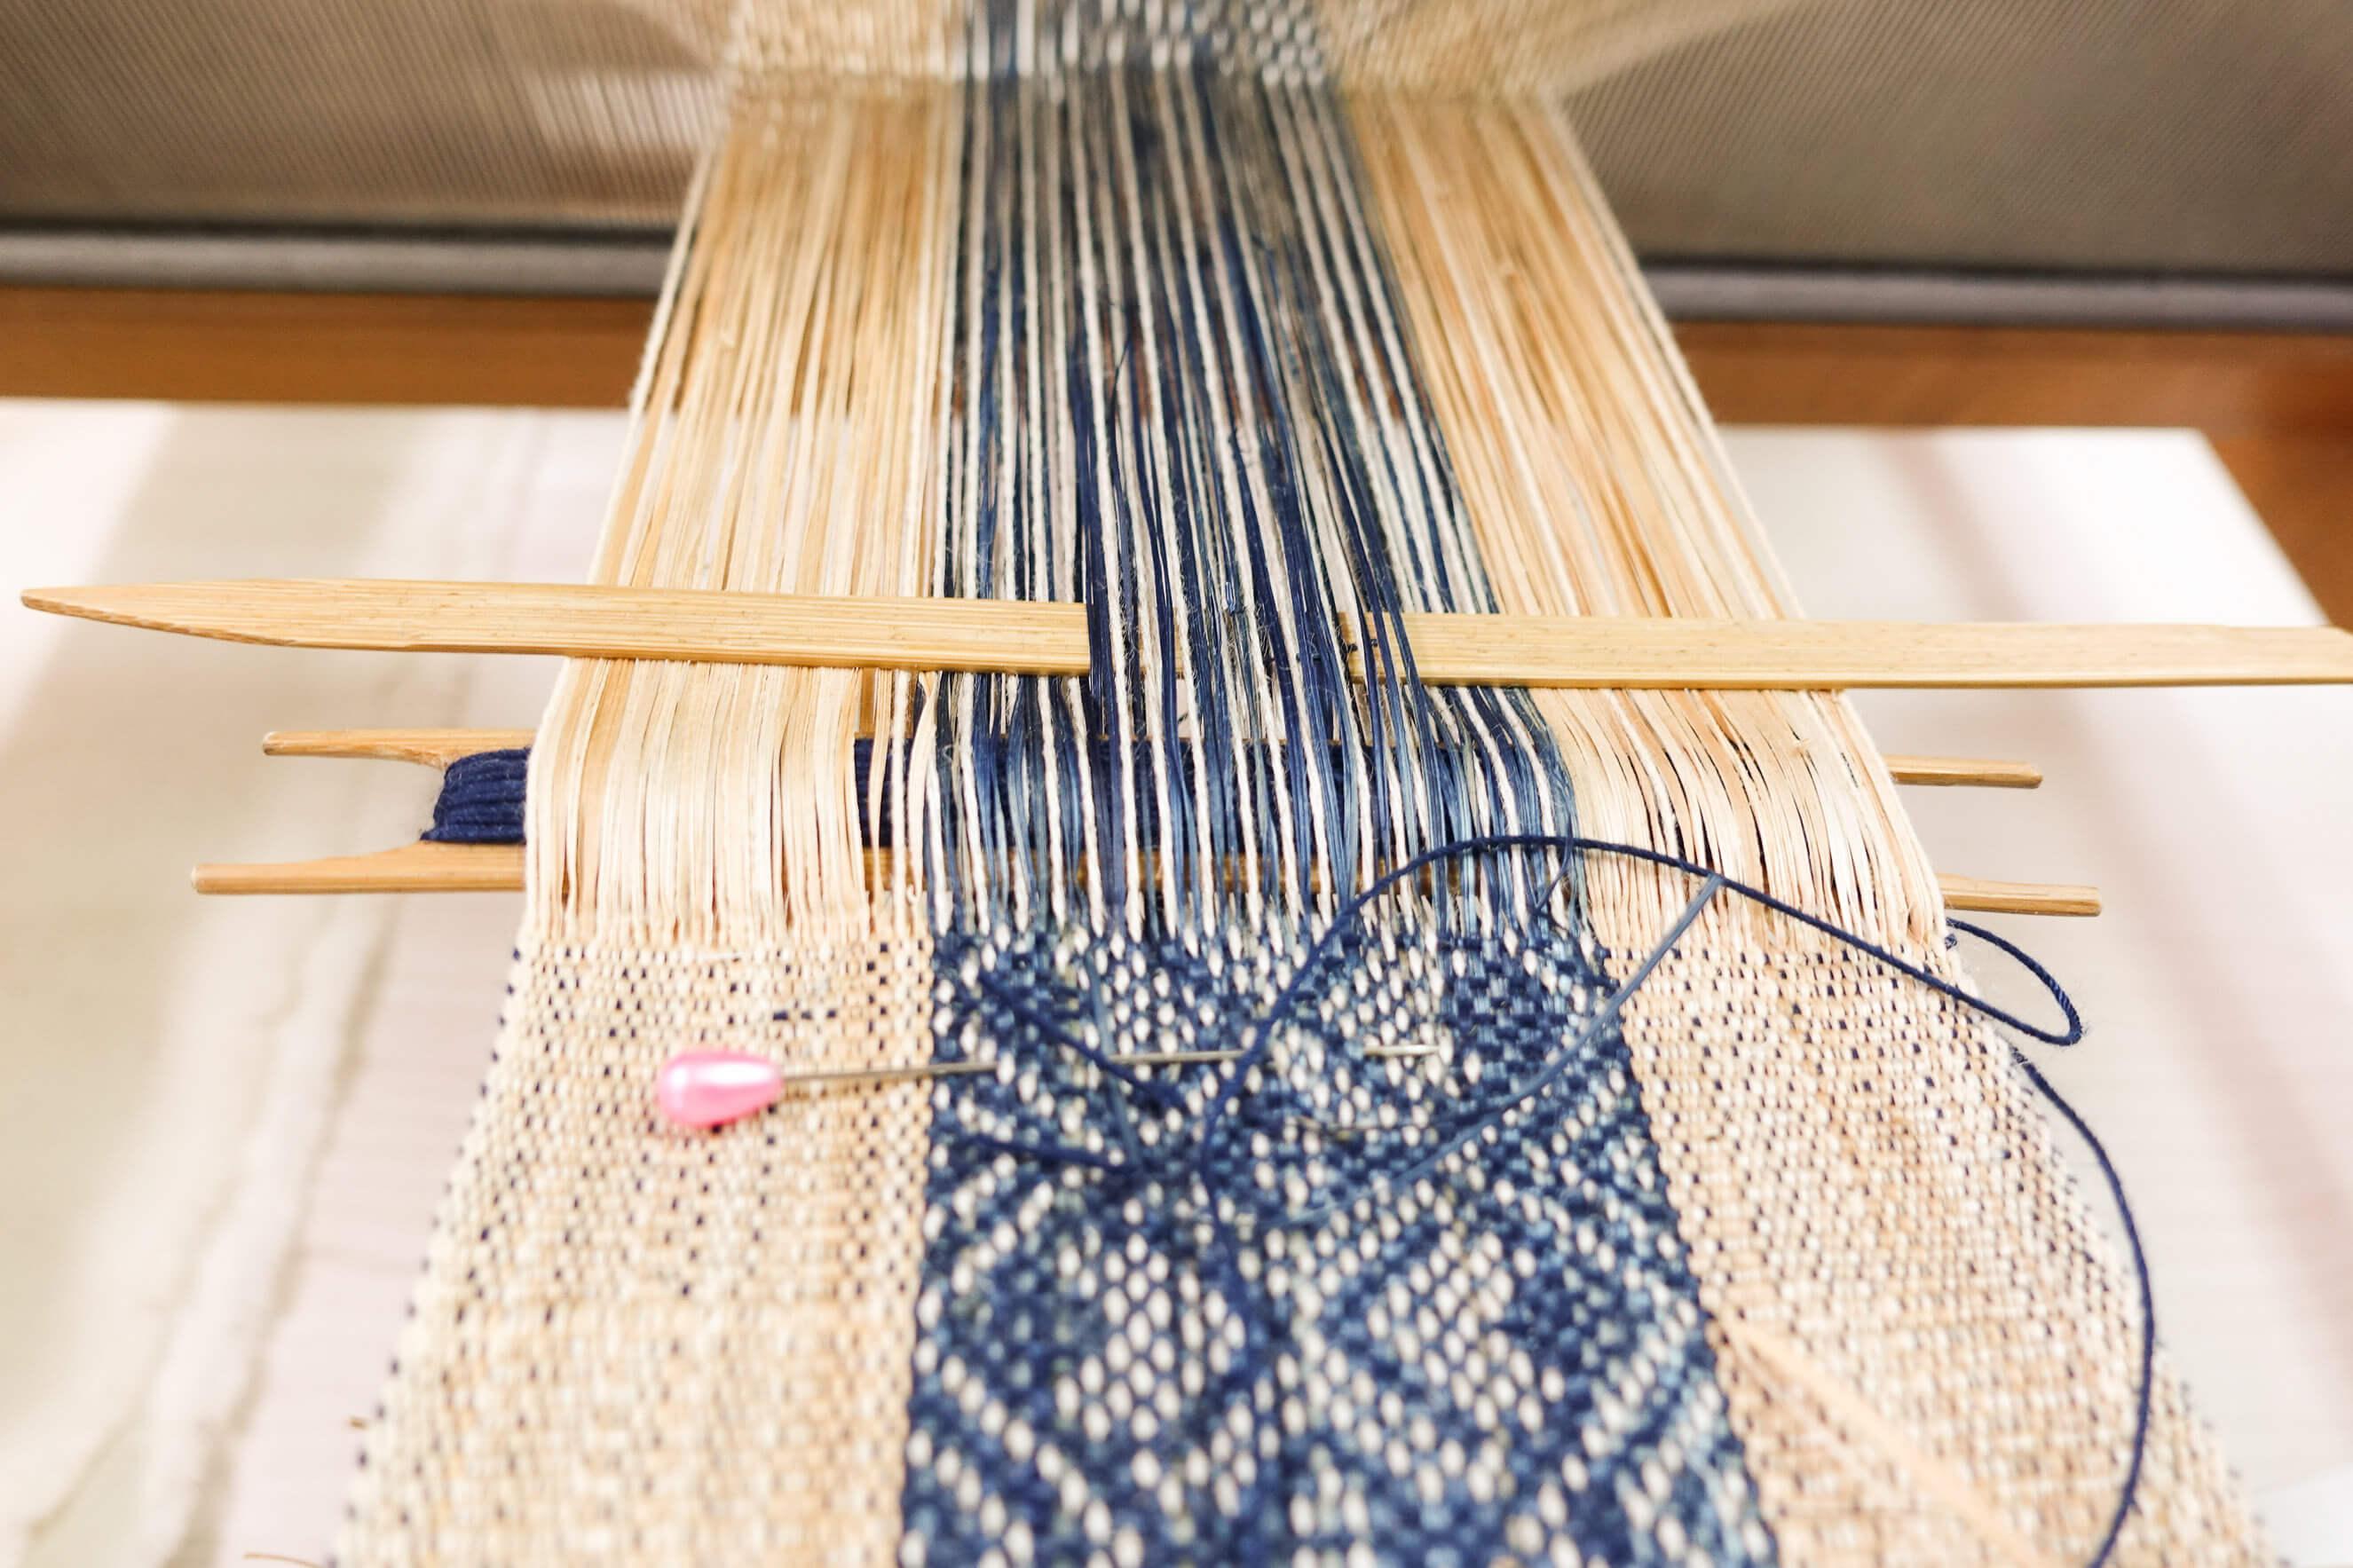 編織工藝2